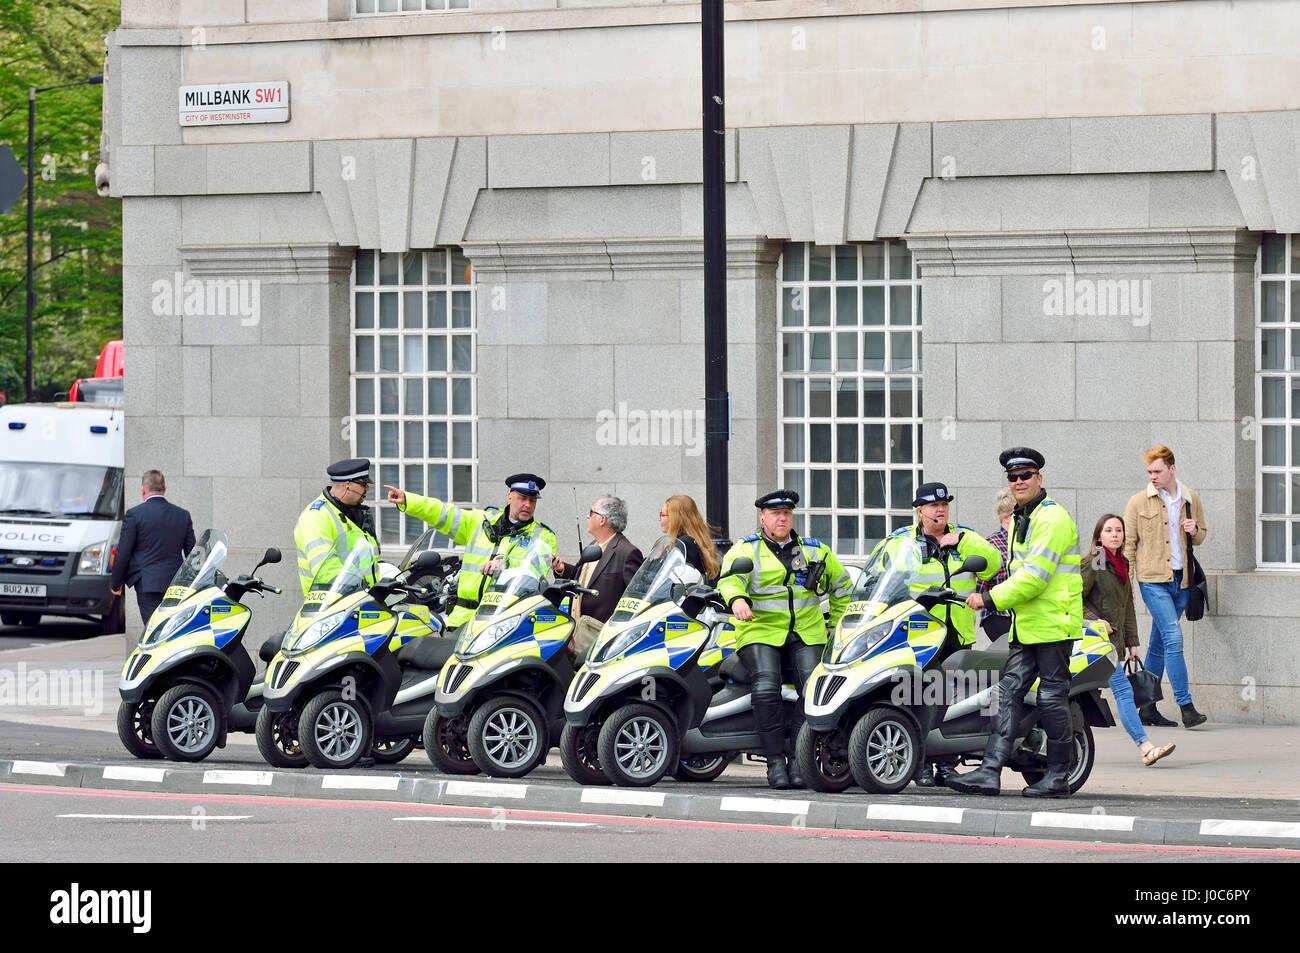 london, england, uk. metropolitan police piaggio mp3 scooters